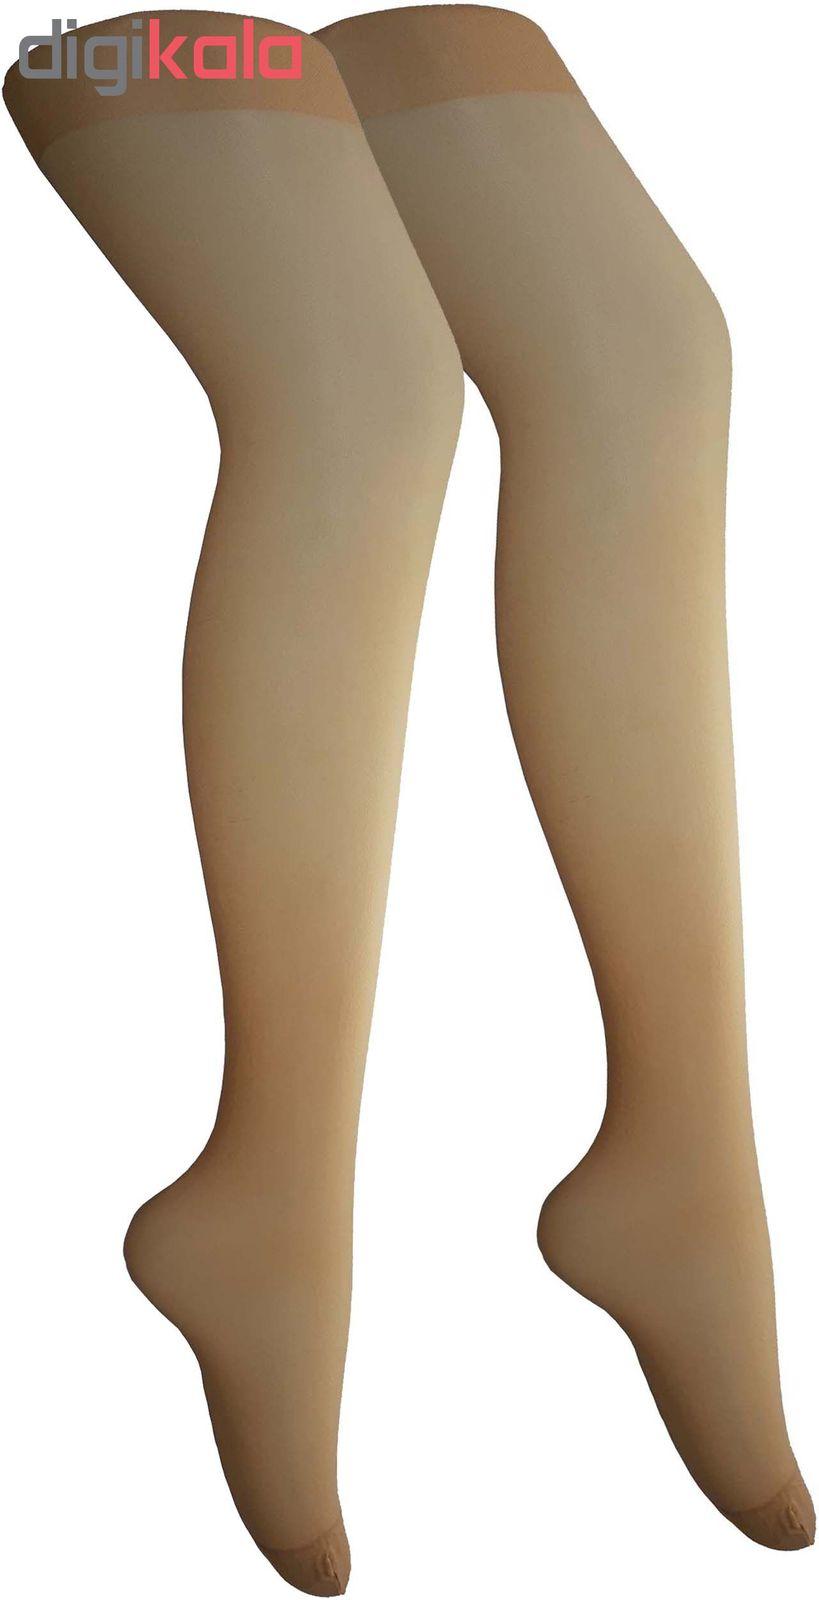 جوراب زنانه مدل 1.20 کد 747 main 1 2